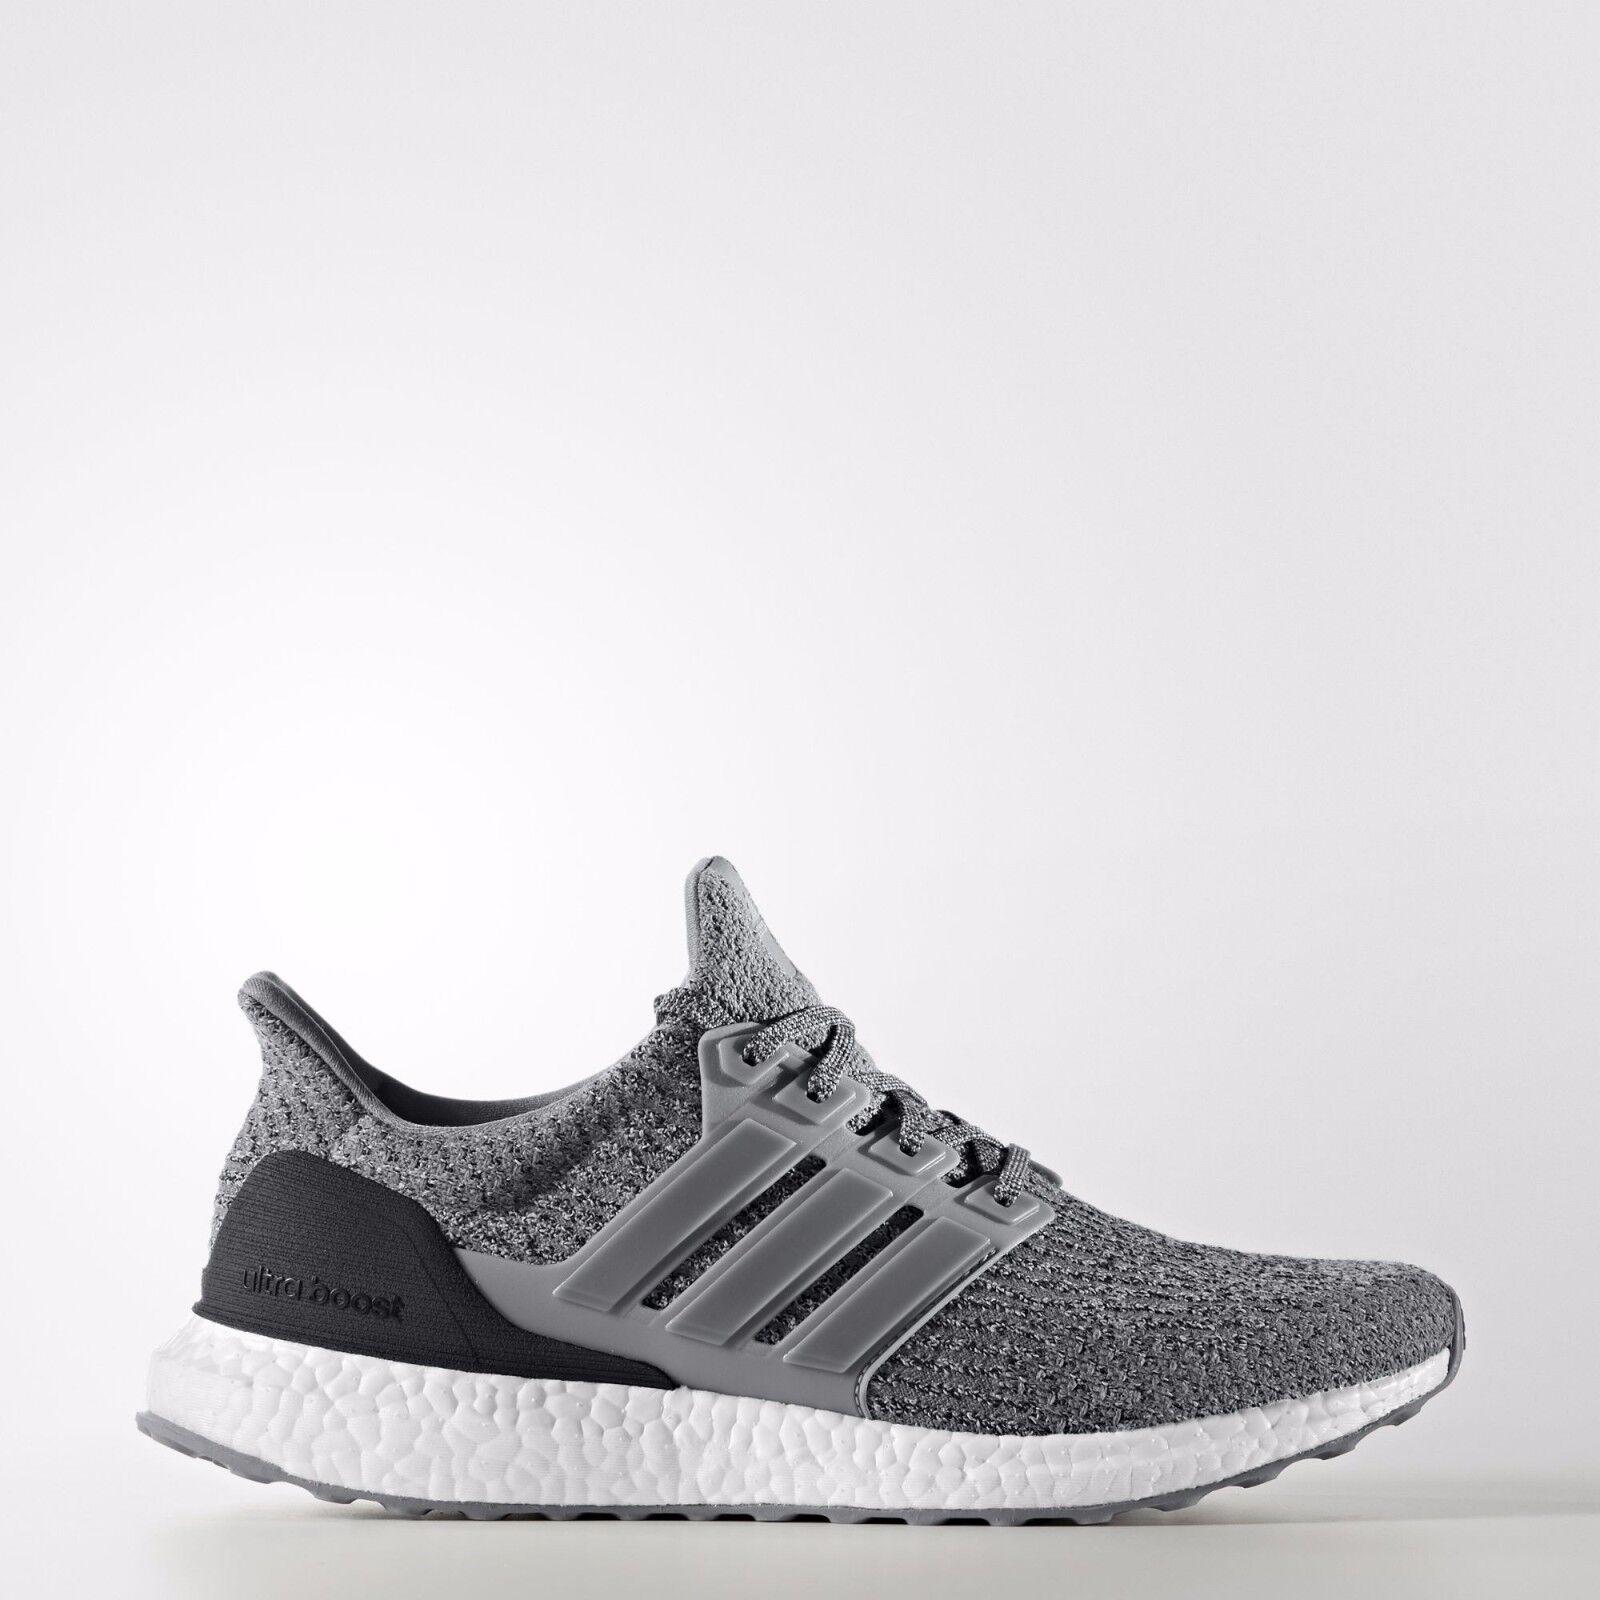 Adidas ultra impulso 3,0 triplo nmd grey dimensioni 9.5.s82023 yeezy nmd triplo pk 4493e5